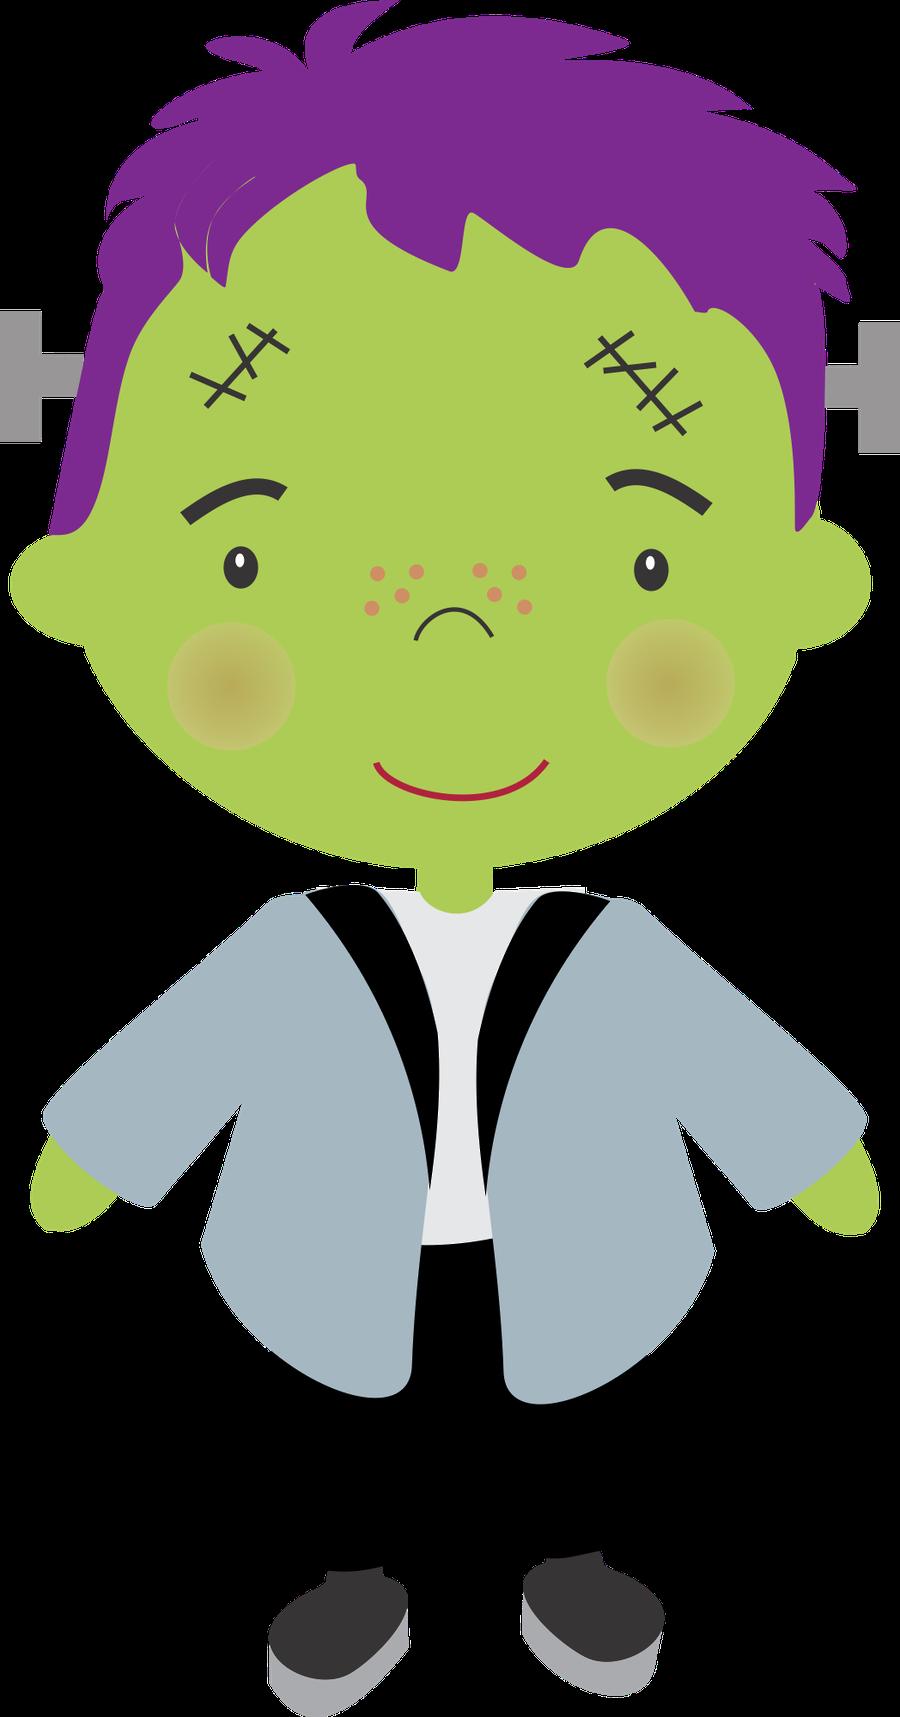 Minus say hello halloween. Frankenstein clipart purple